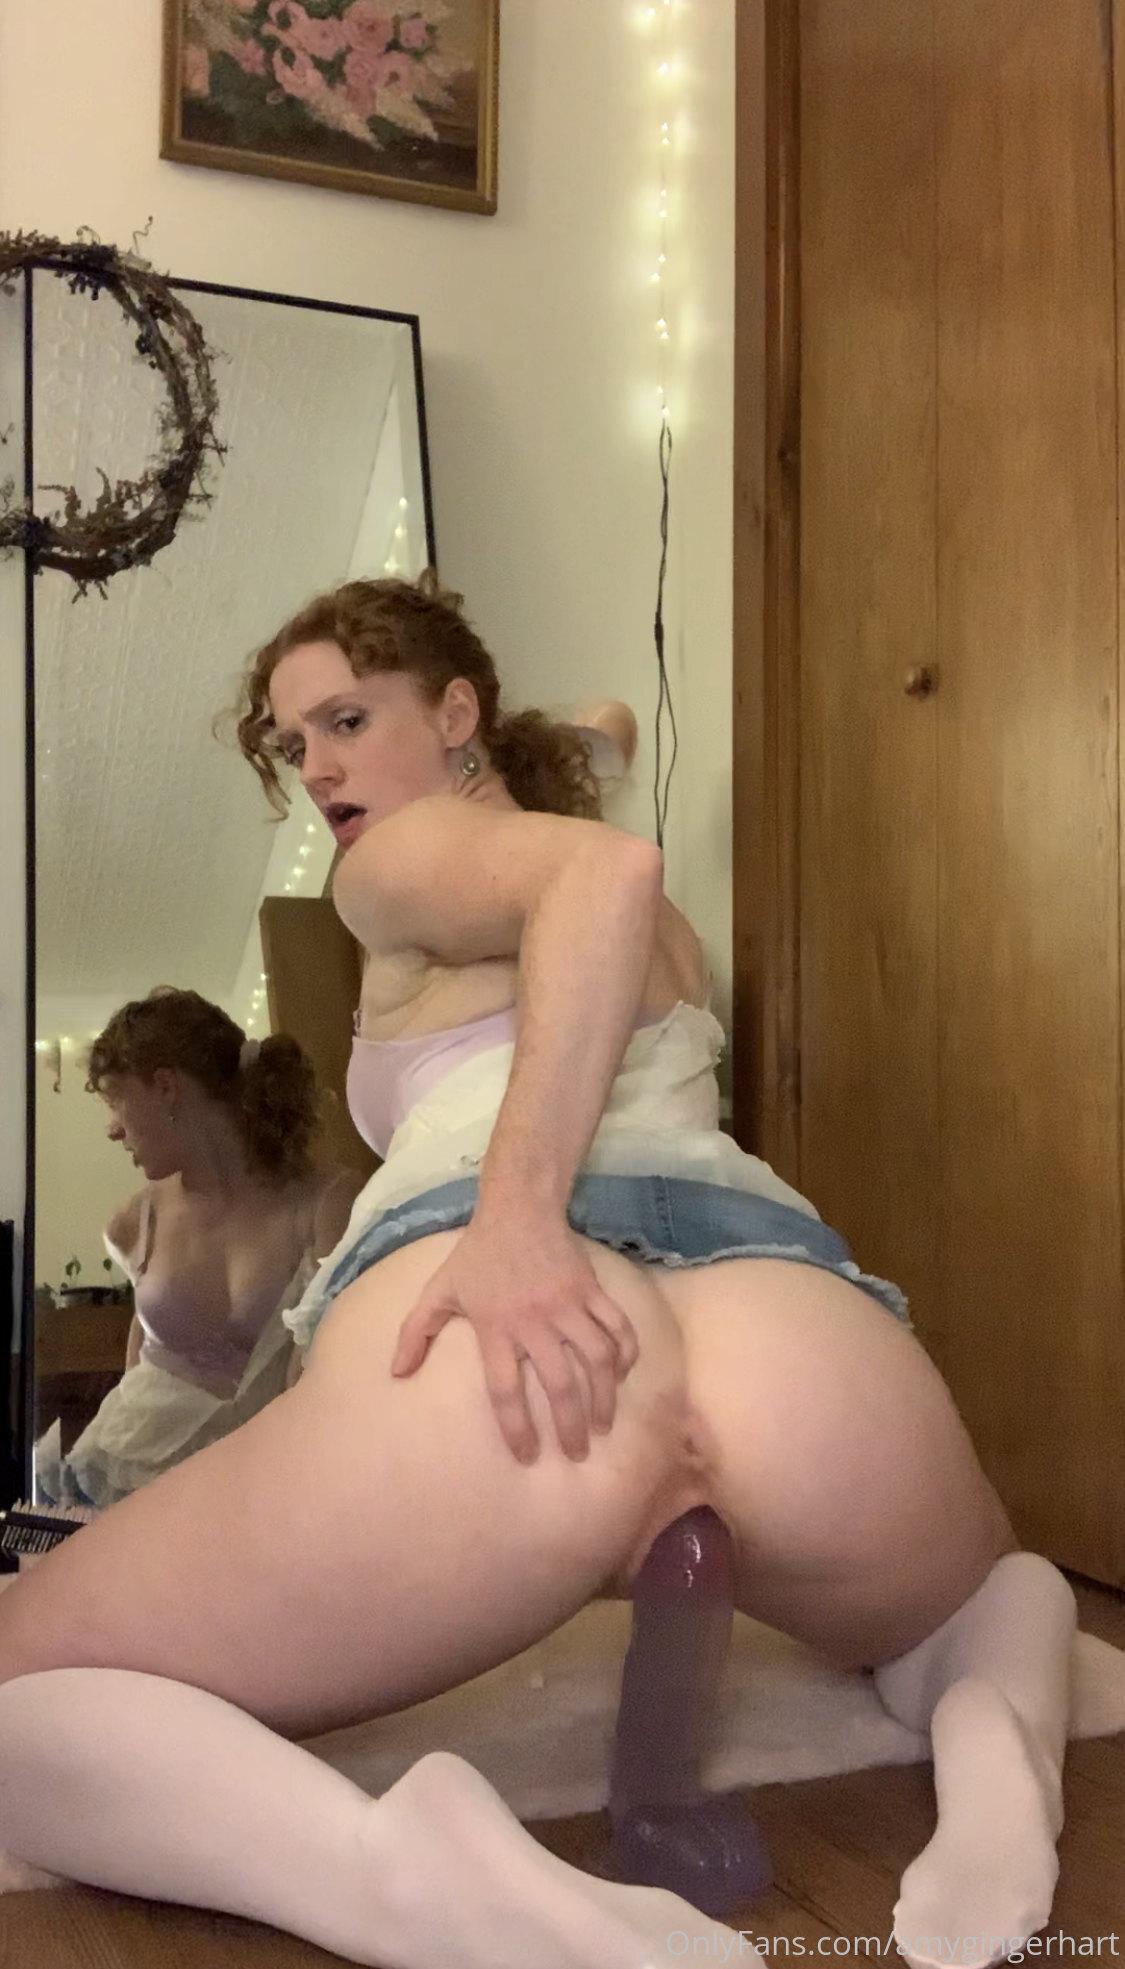 Amy Hart, Amygingerhart, Onlyfans 0177